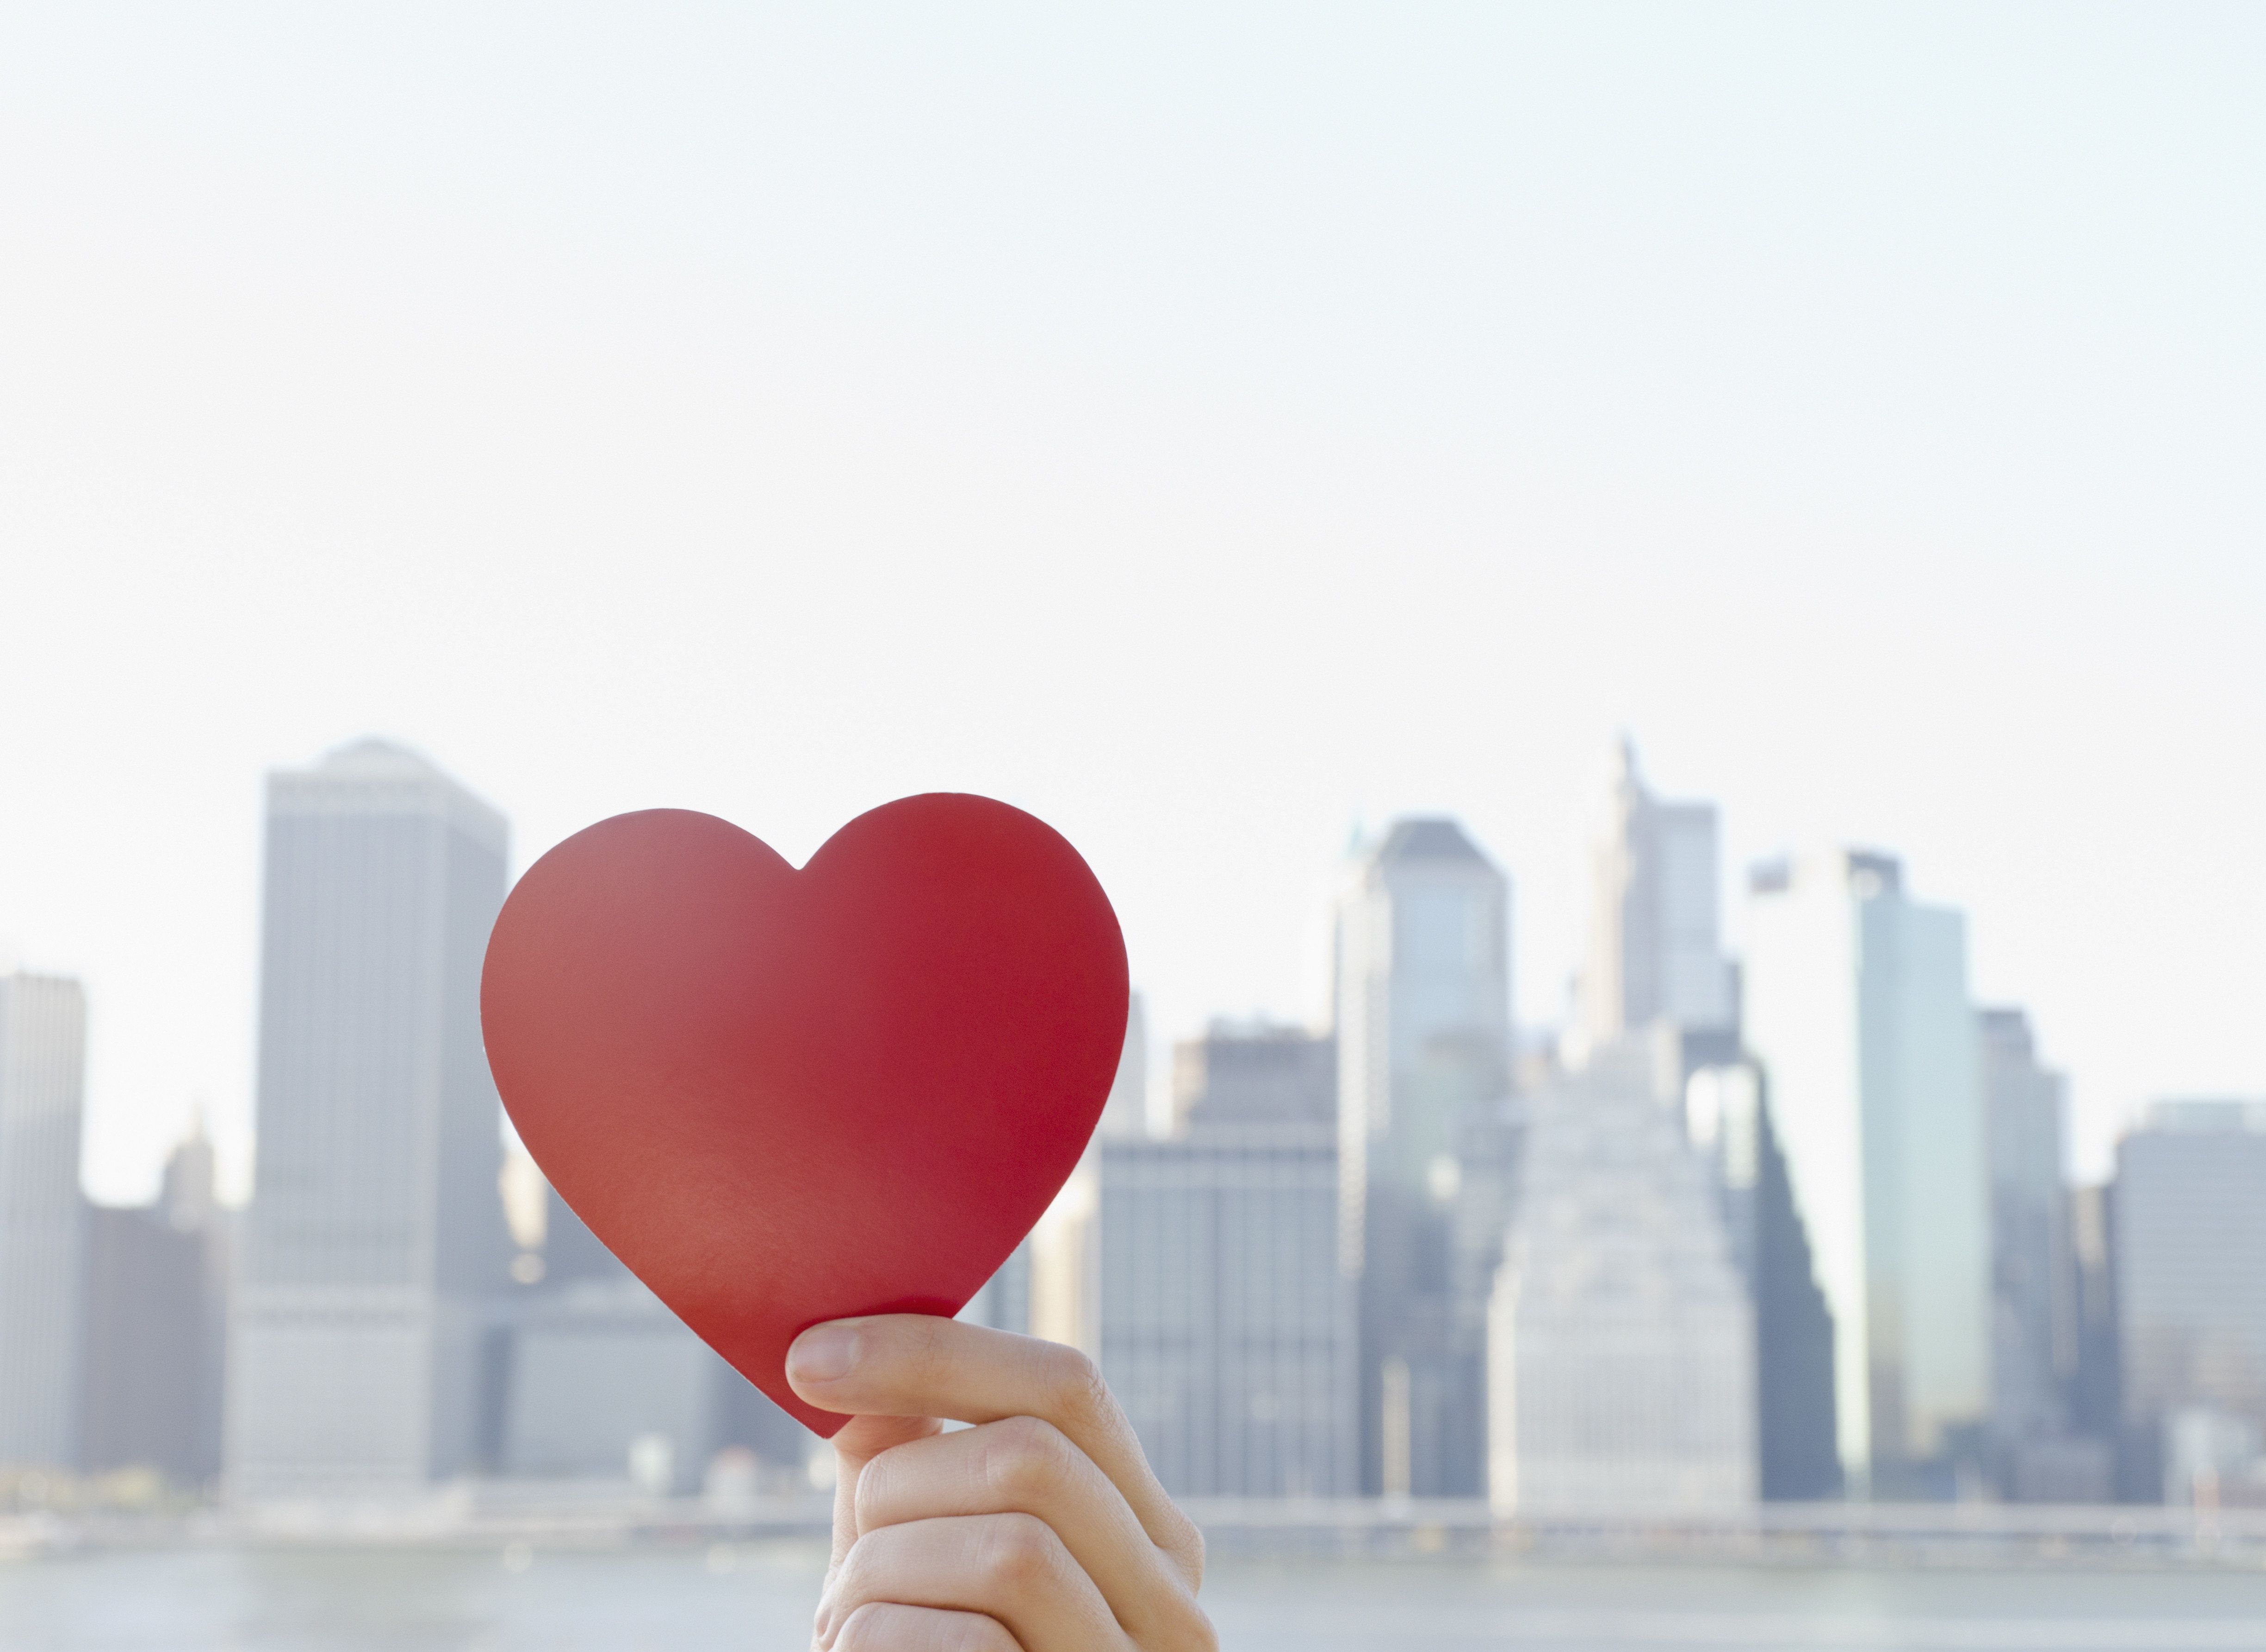 USA, New York State, New York City, Manhattan, Hand holding heart shape